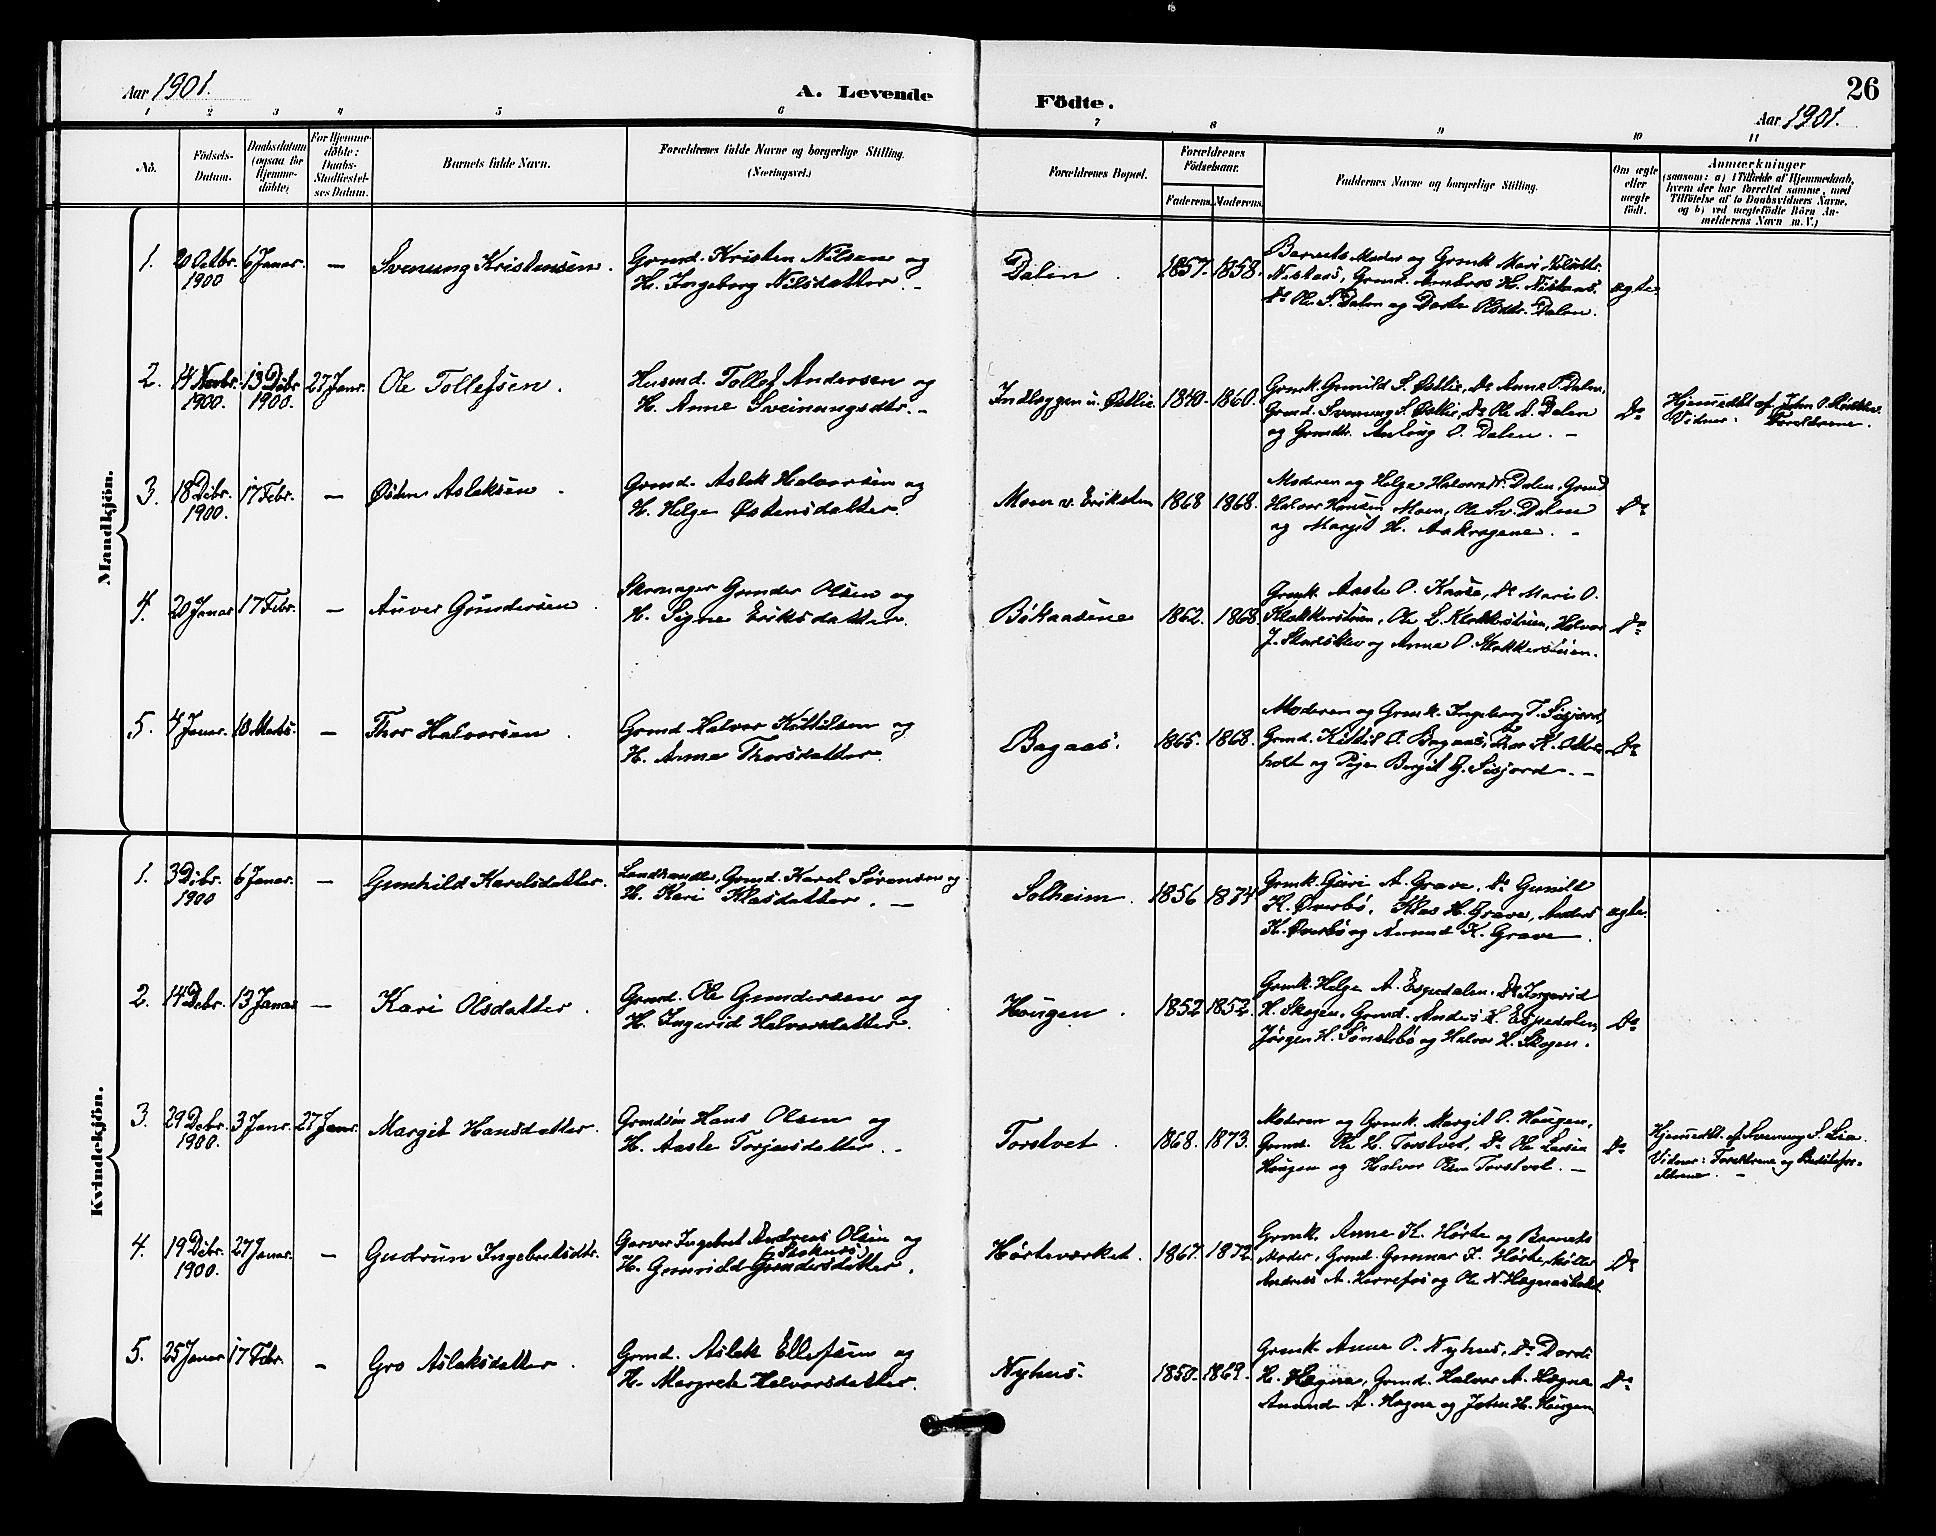 SAKO, Bø kirkebøker, G/Ga/L0006: Klokkerbok nr. 6, 1898-1909, s. 26